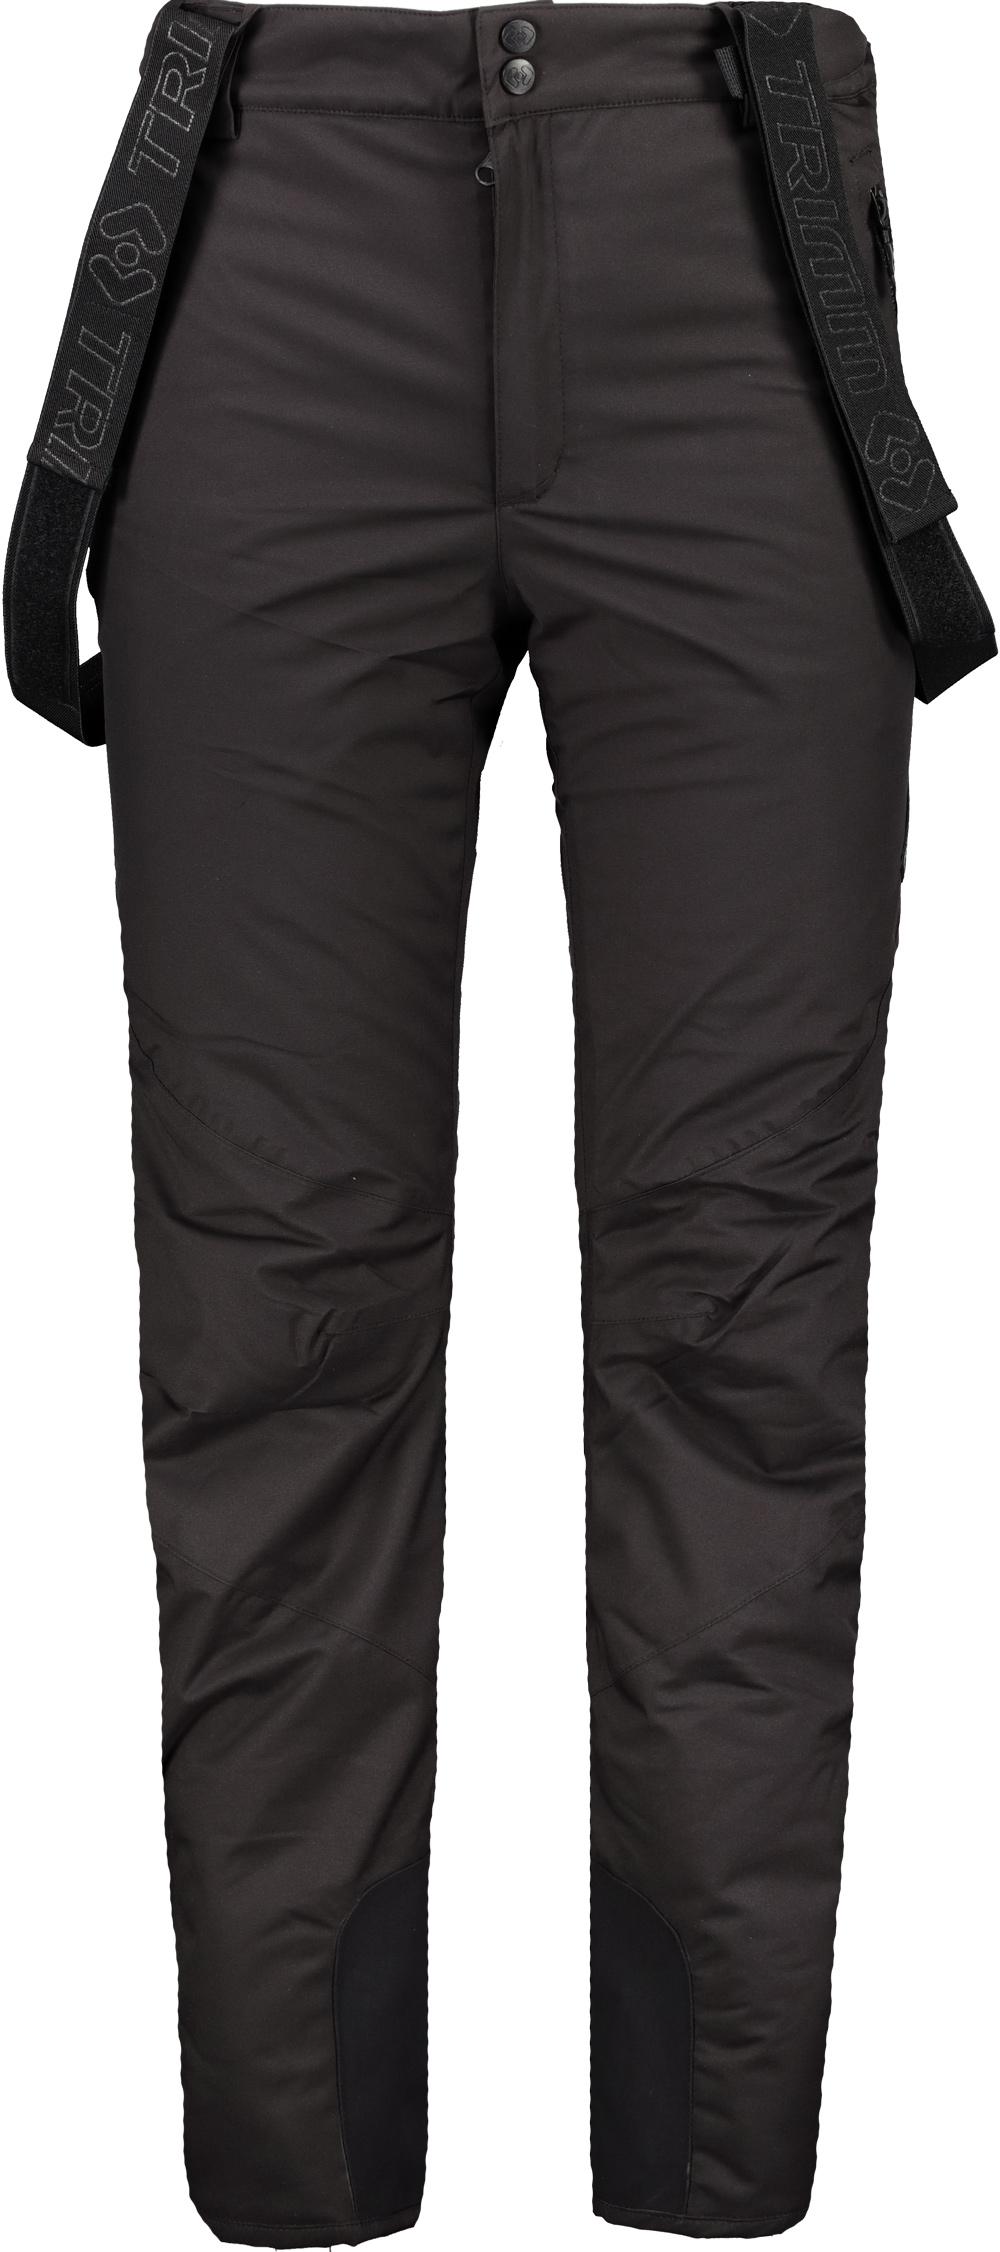 Kalhoty lyžařské pánské TRIMM DERRYL